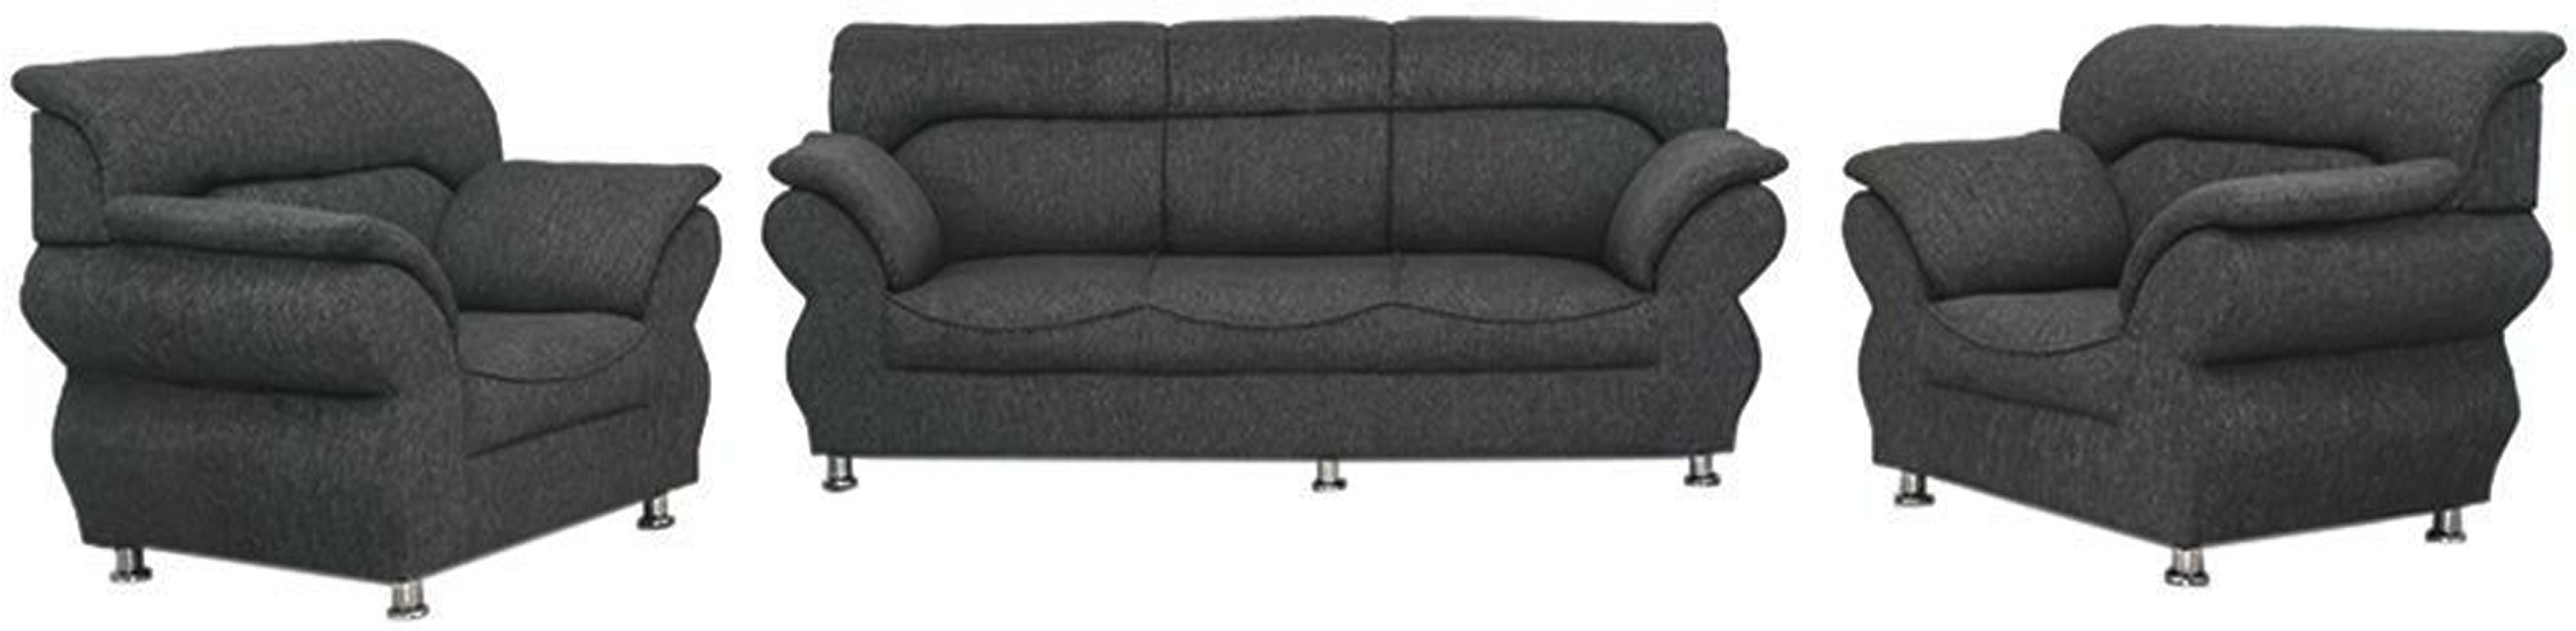 View Comfy Sofa Classy Fabric 3 + 1 + 1 Grey Sofa Set(Configuration - Straight) Furniture (COMFY SOFA)